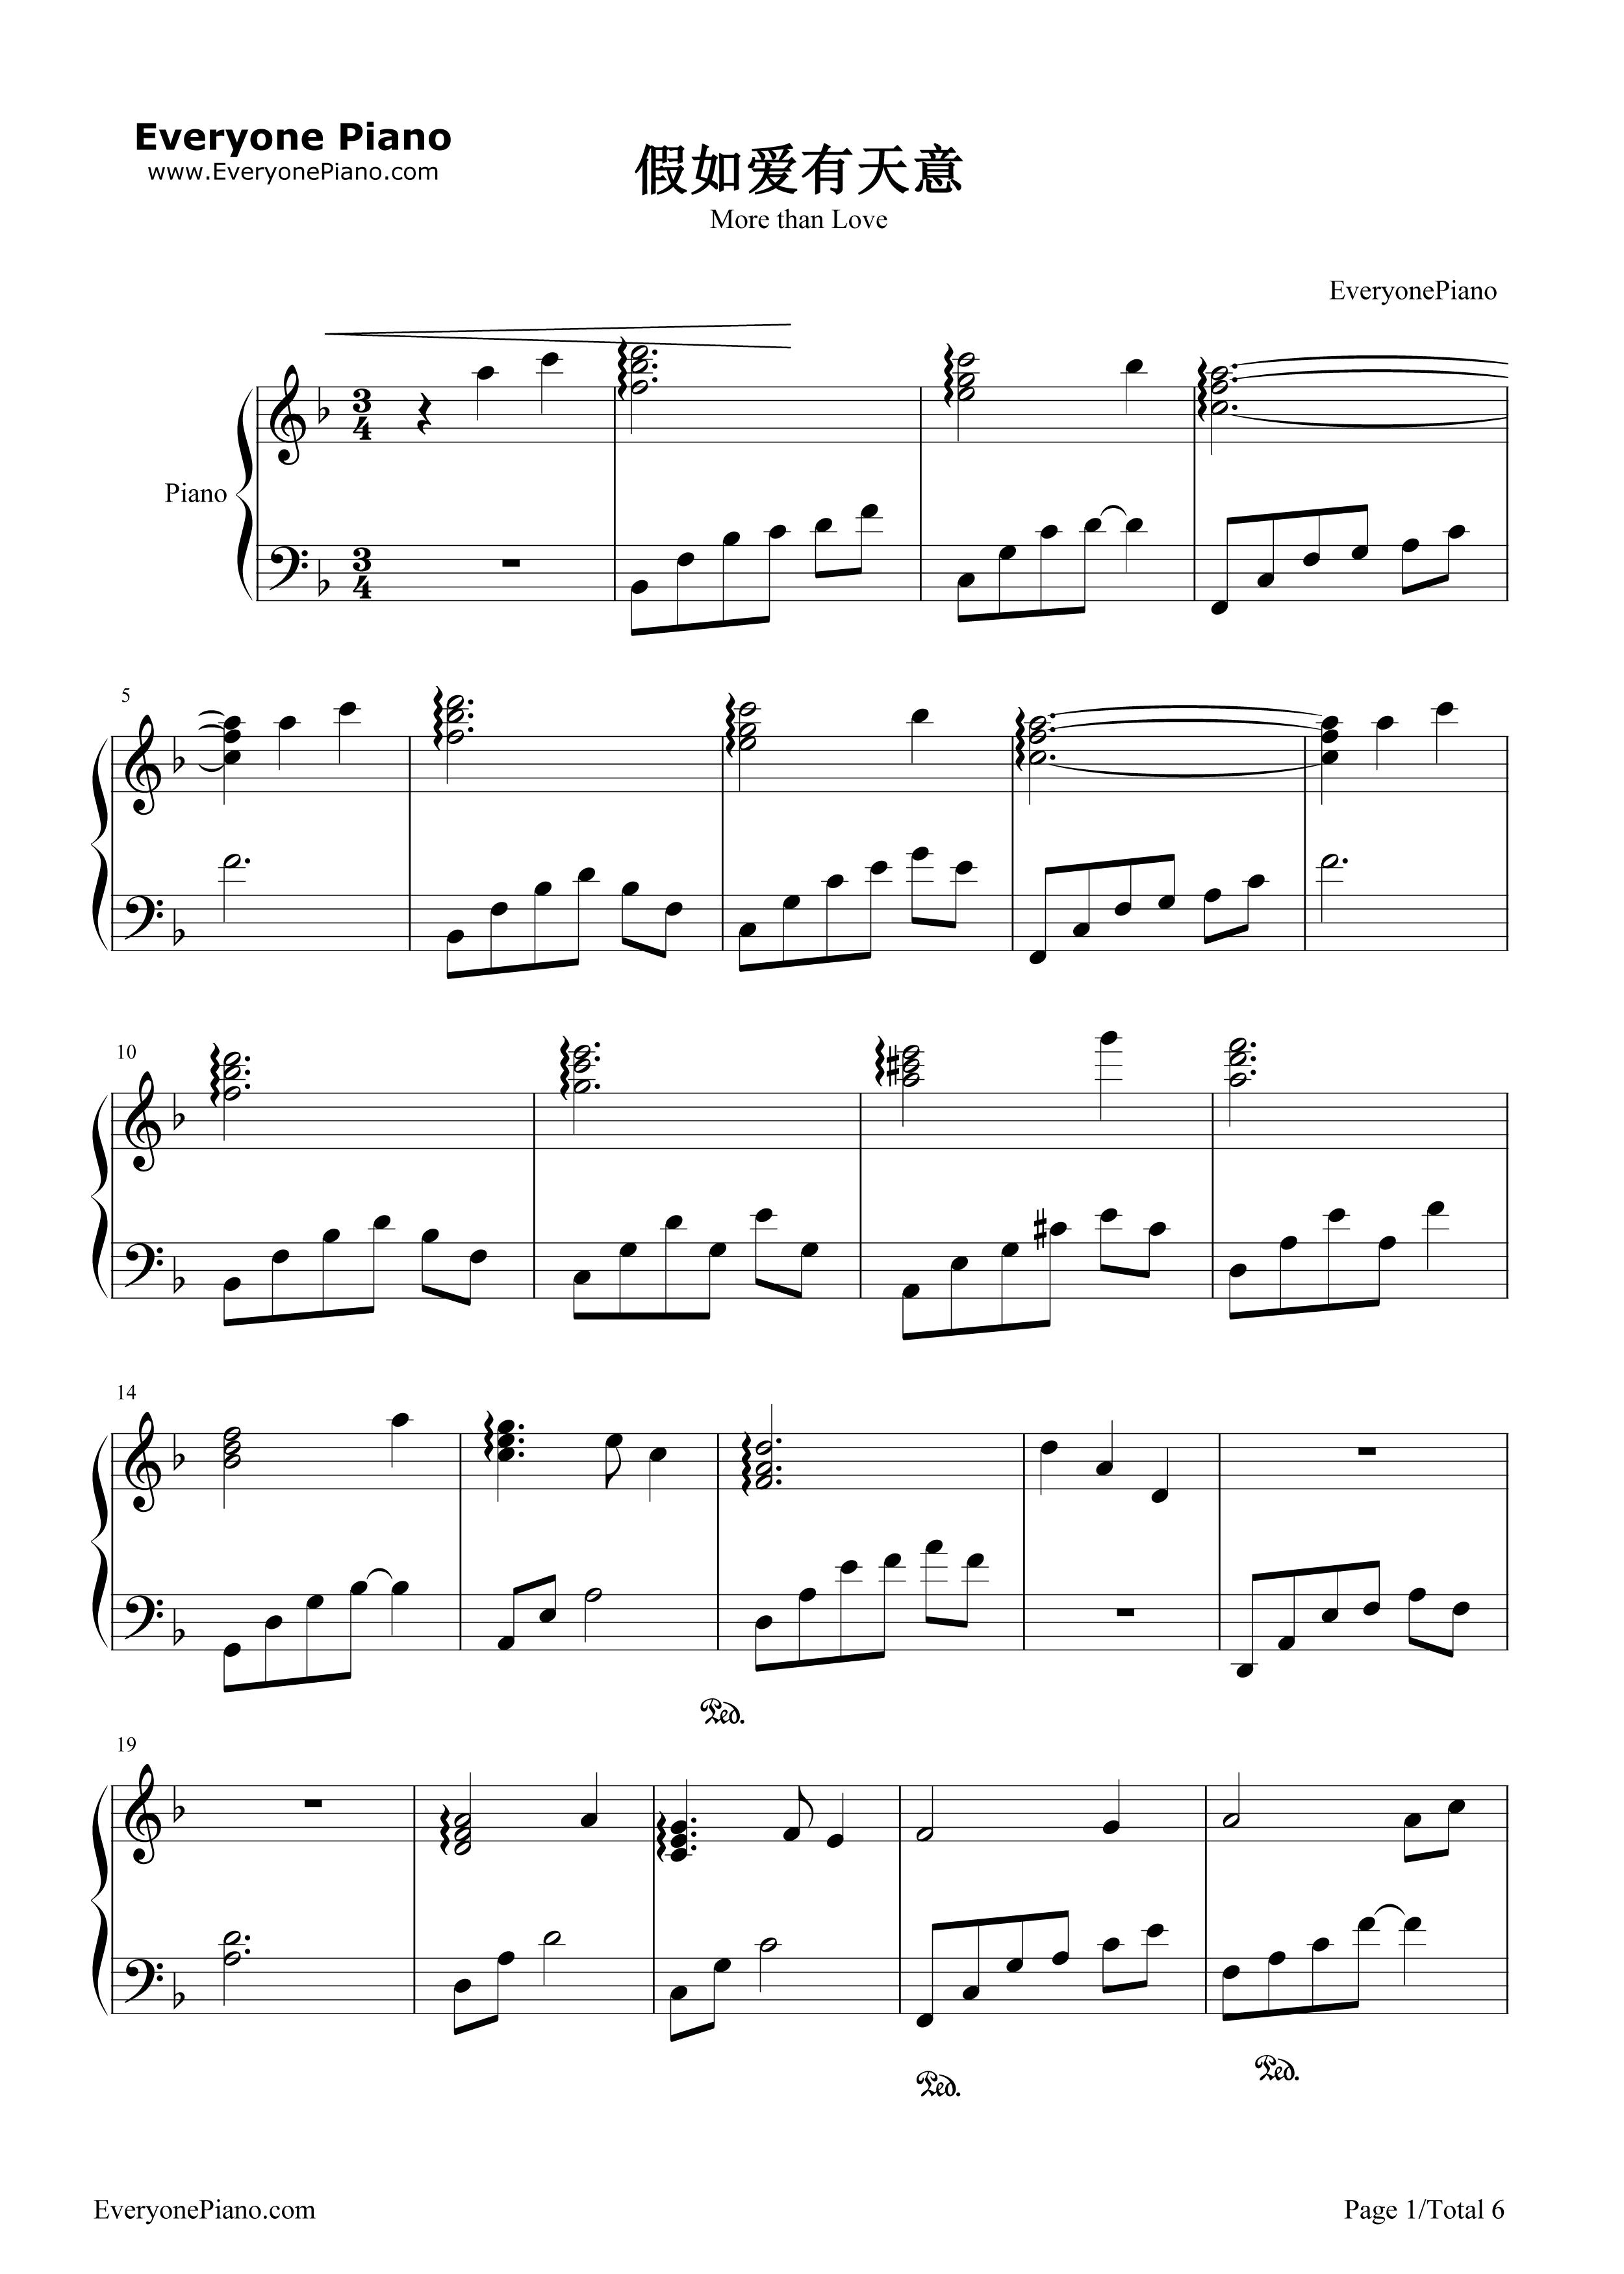 Classical Piano Sheet Music Downloads | Musicnotes.com